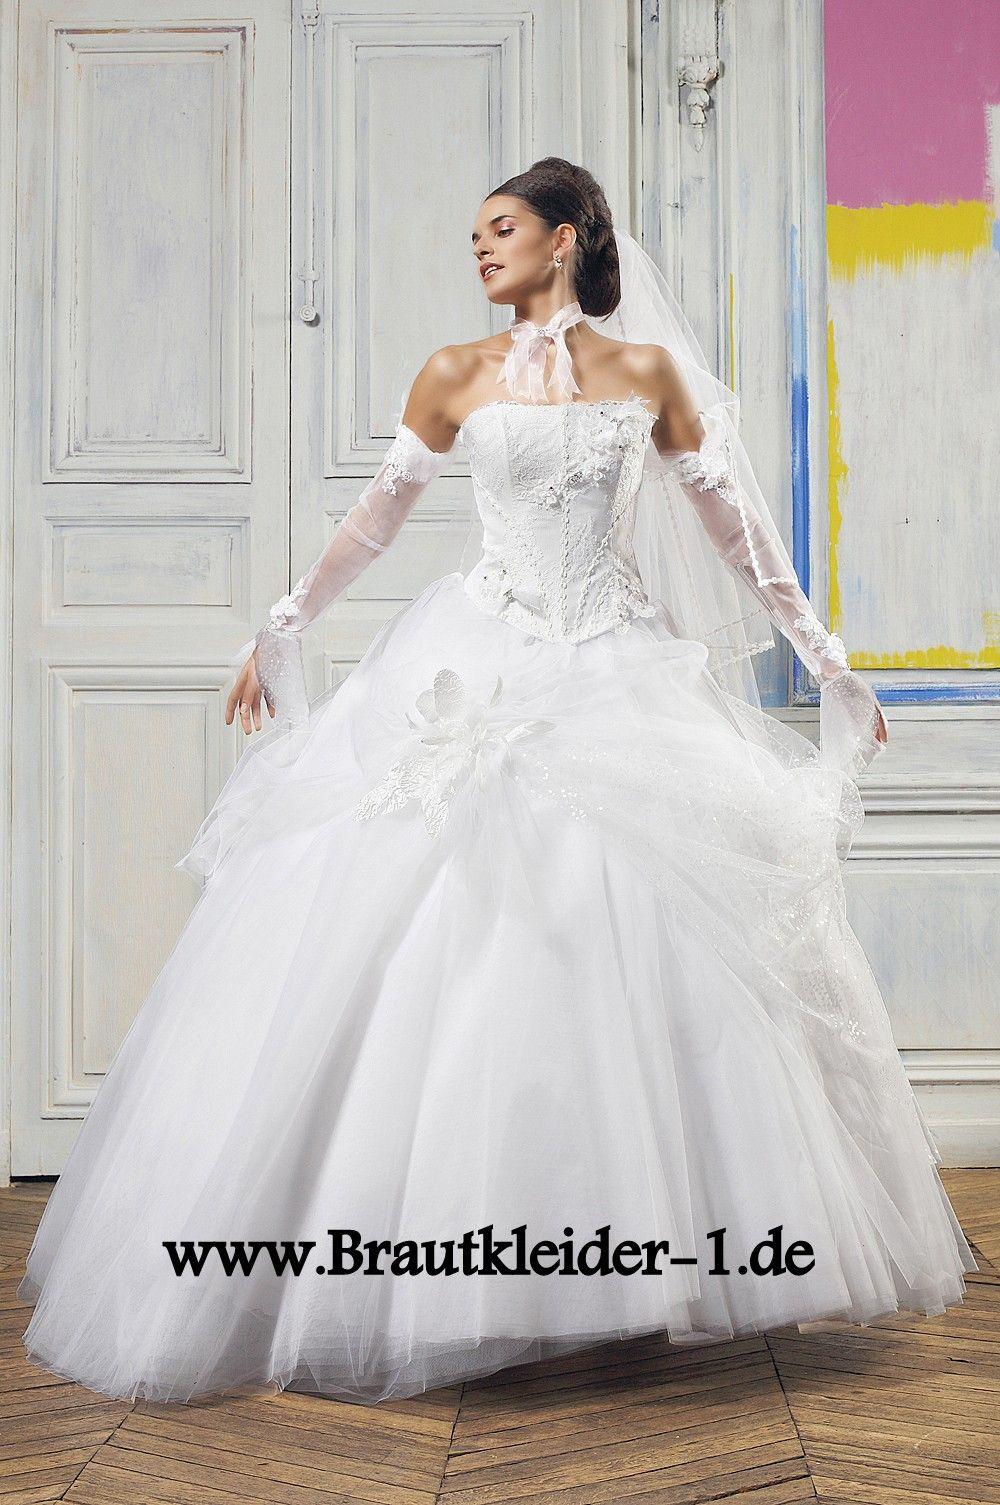 Tüll Brautkleid Online mit Corsage | Brautkleid | Pinterest | Tüll ...